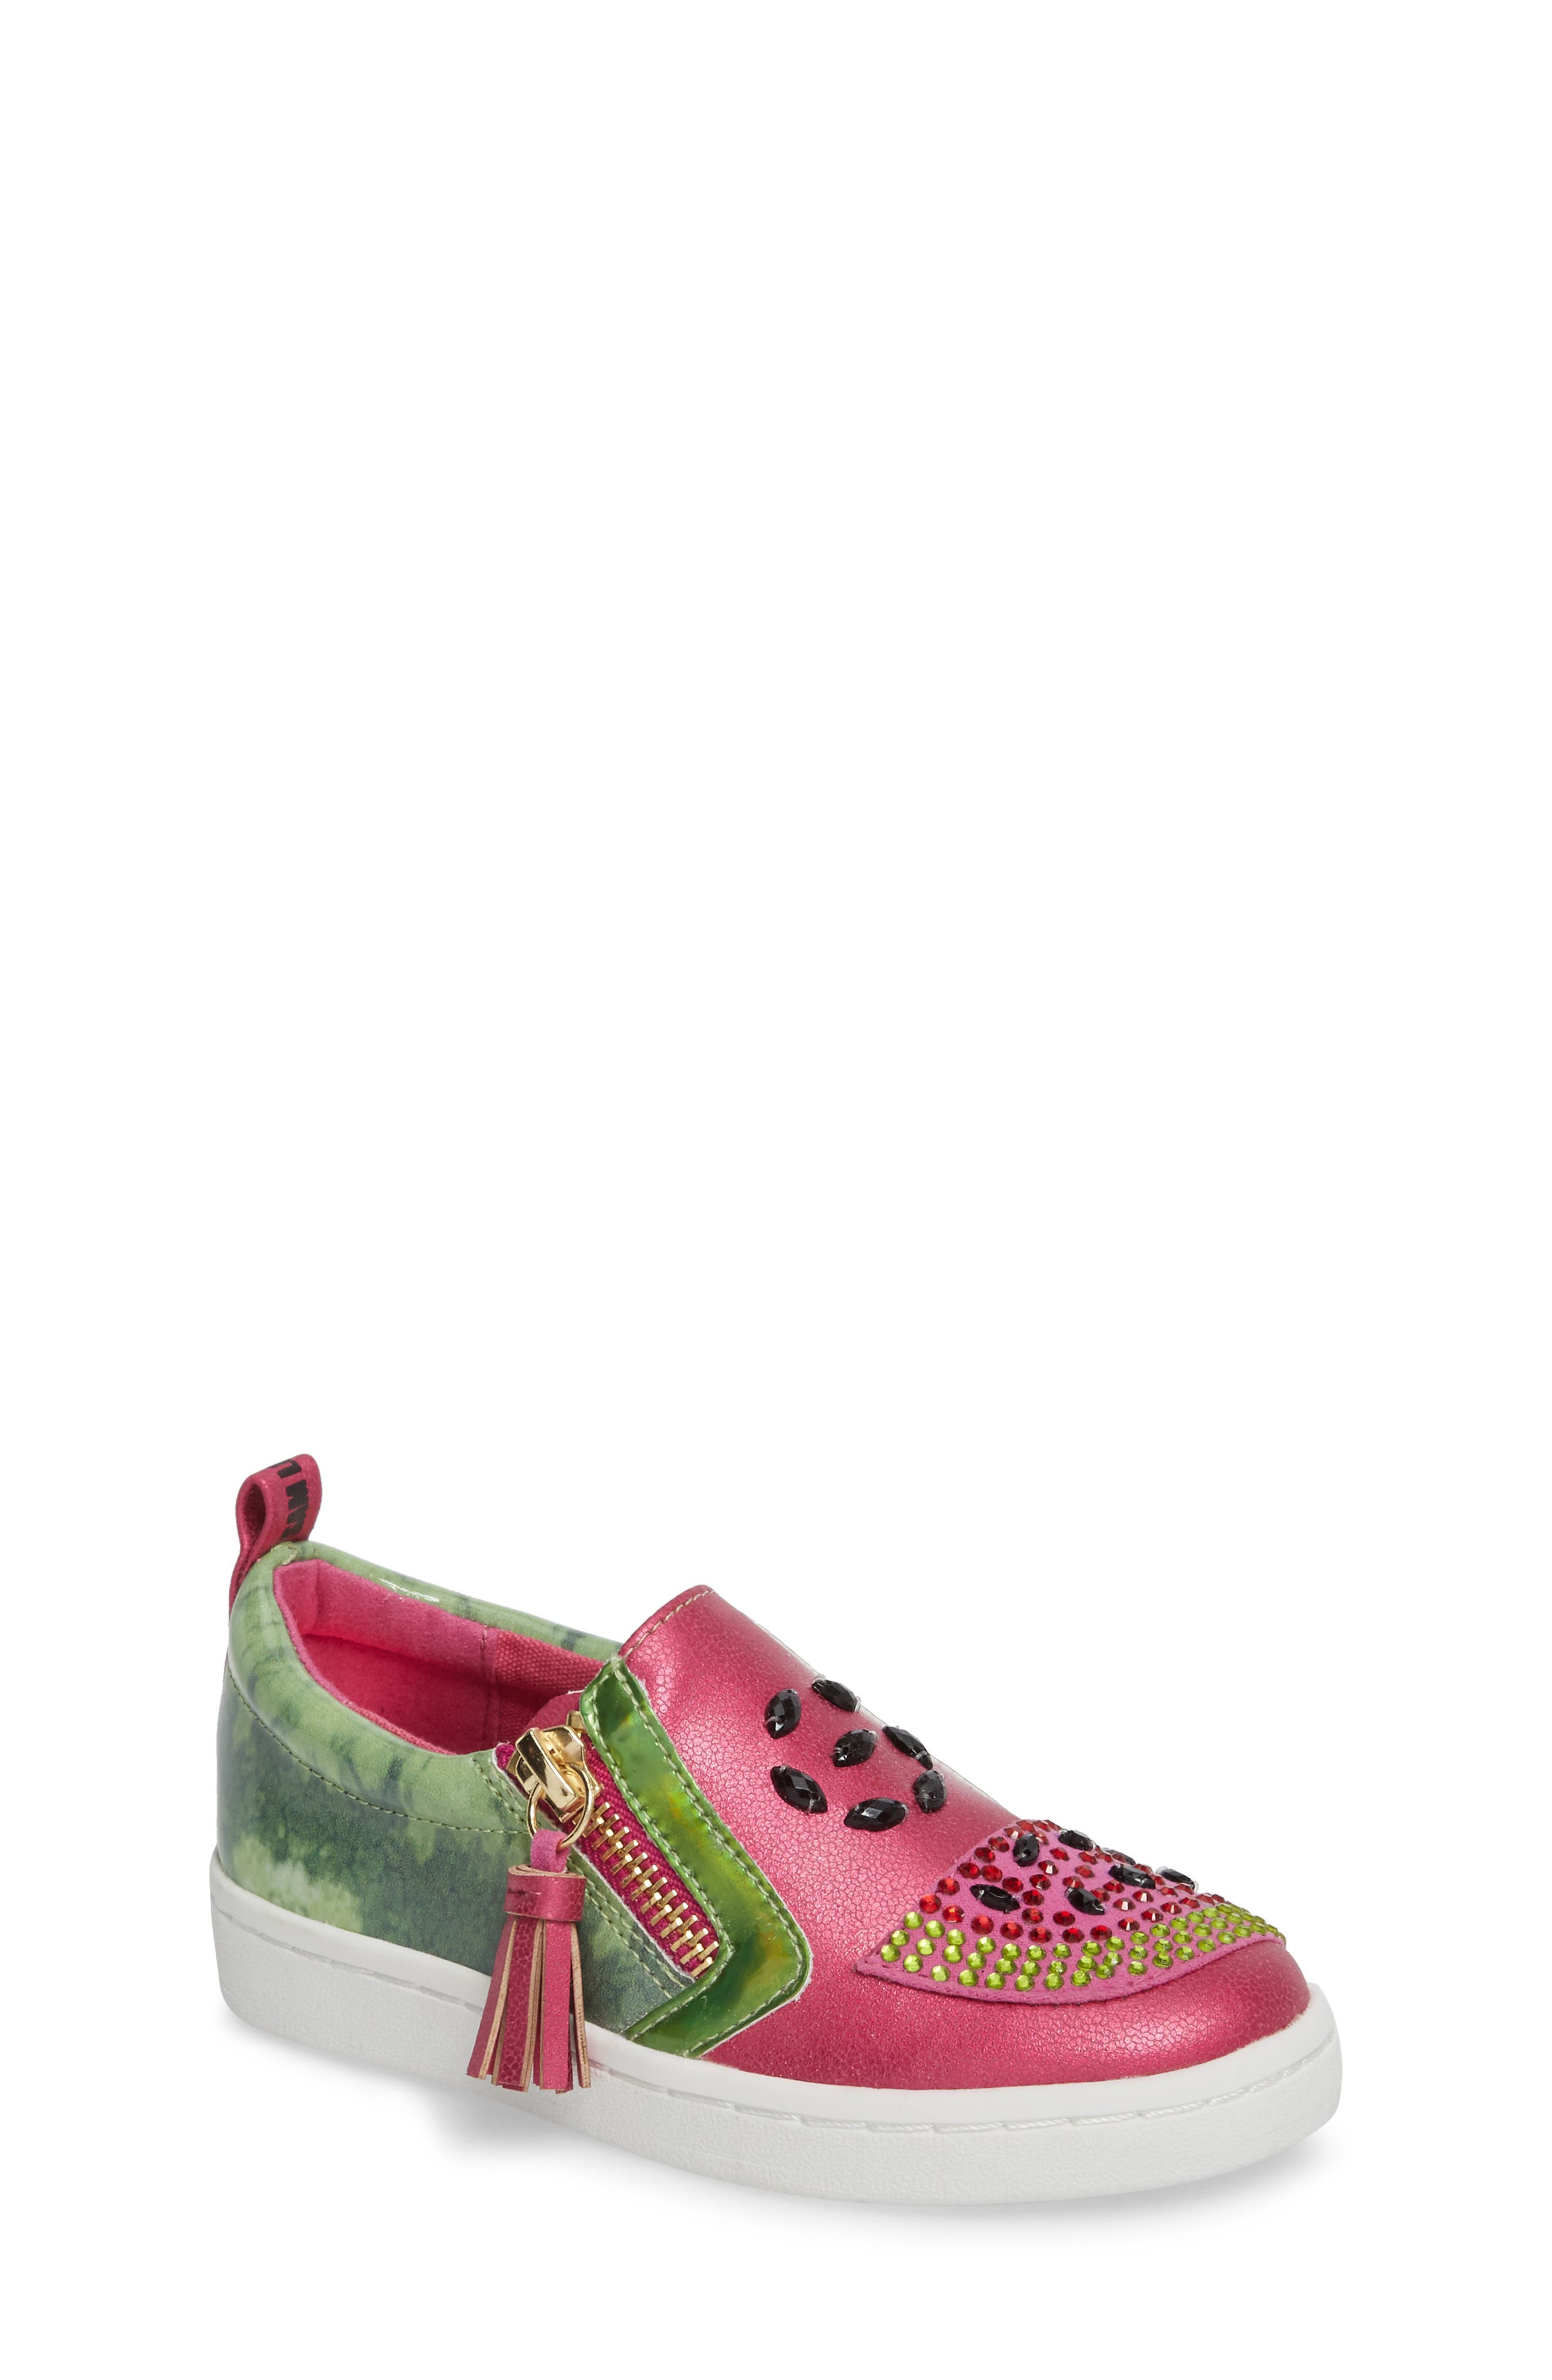 Blane Watermelon Sneaker,                             Main thumbnail 1, color,                             653